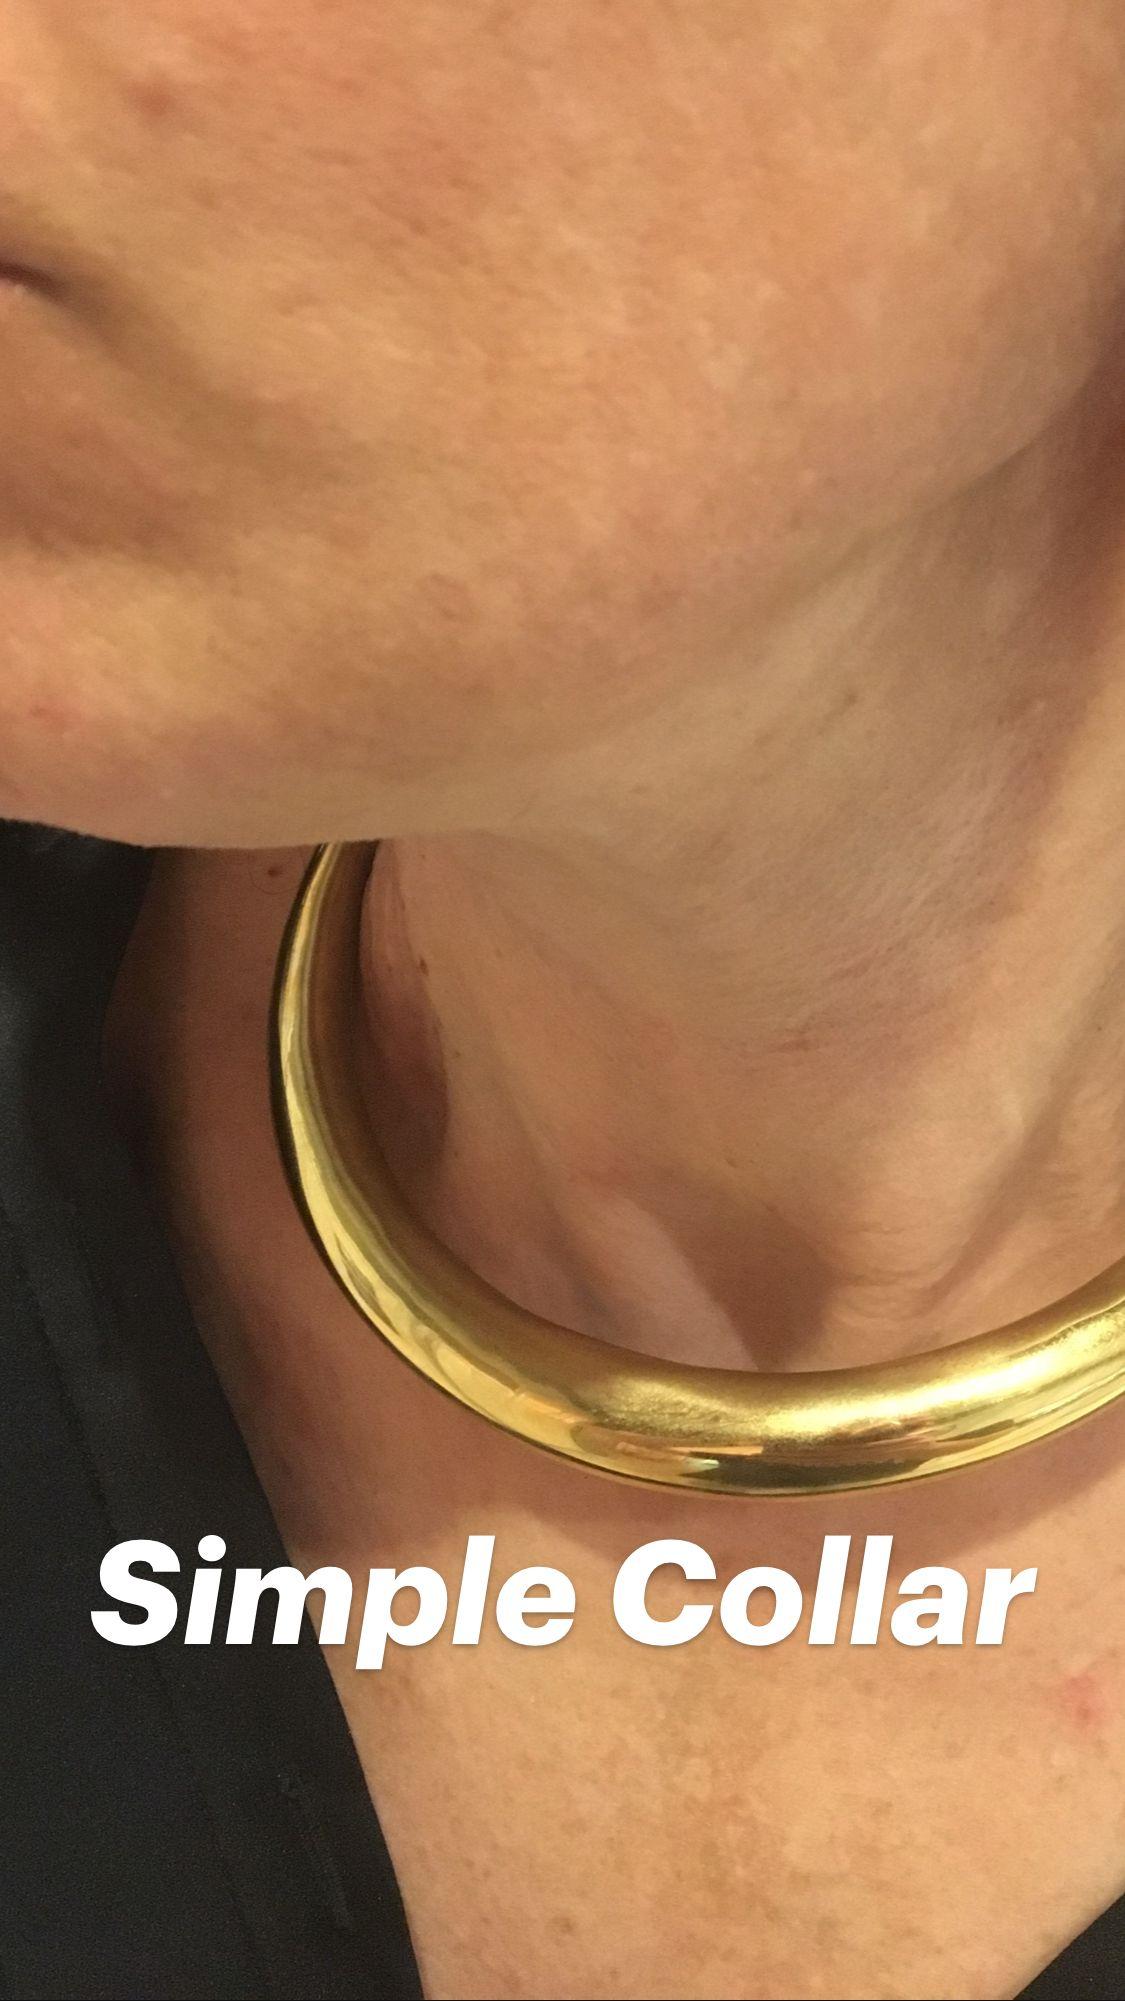 Simple Collar